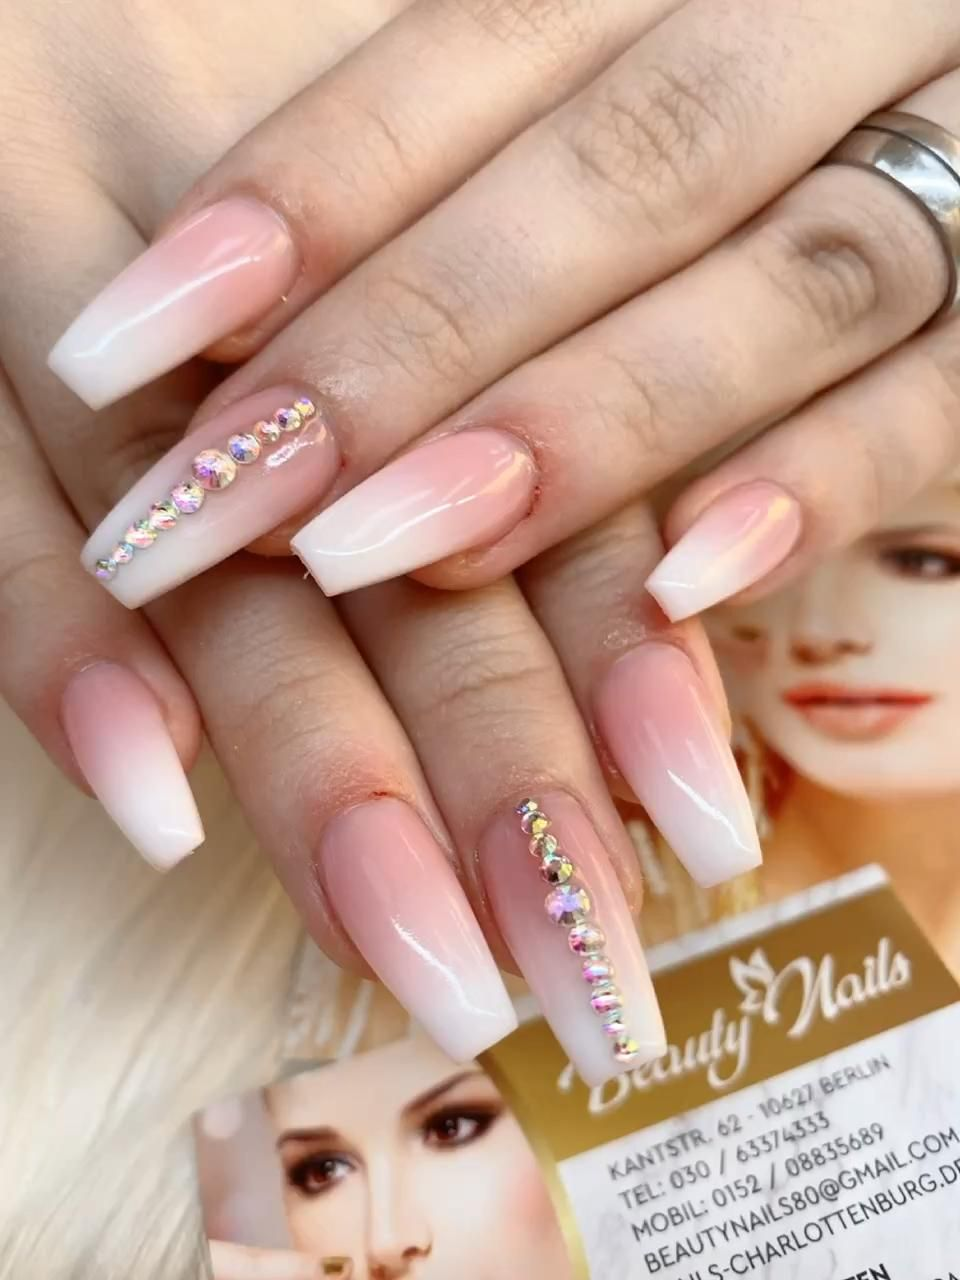 Beauty Nails – In Berlin Charlottenburg https://www.nails-charlottenburg.de